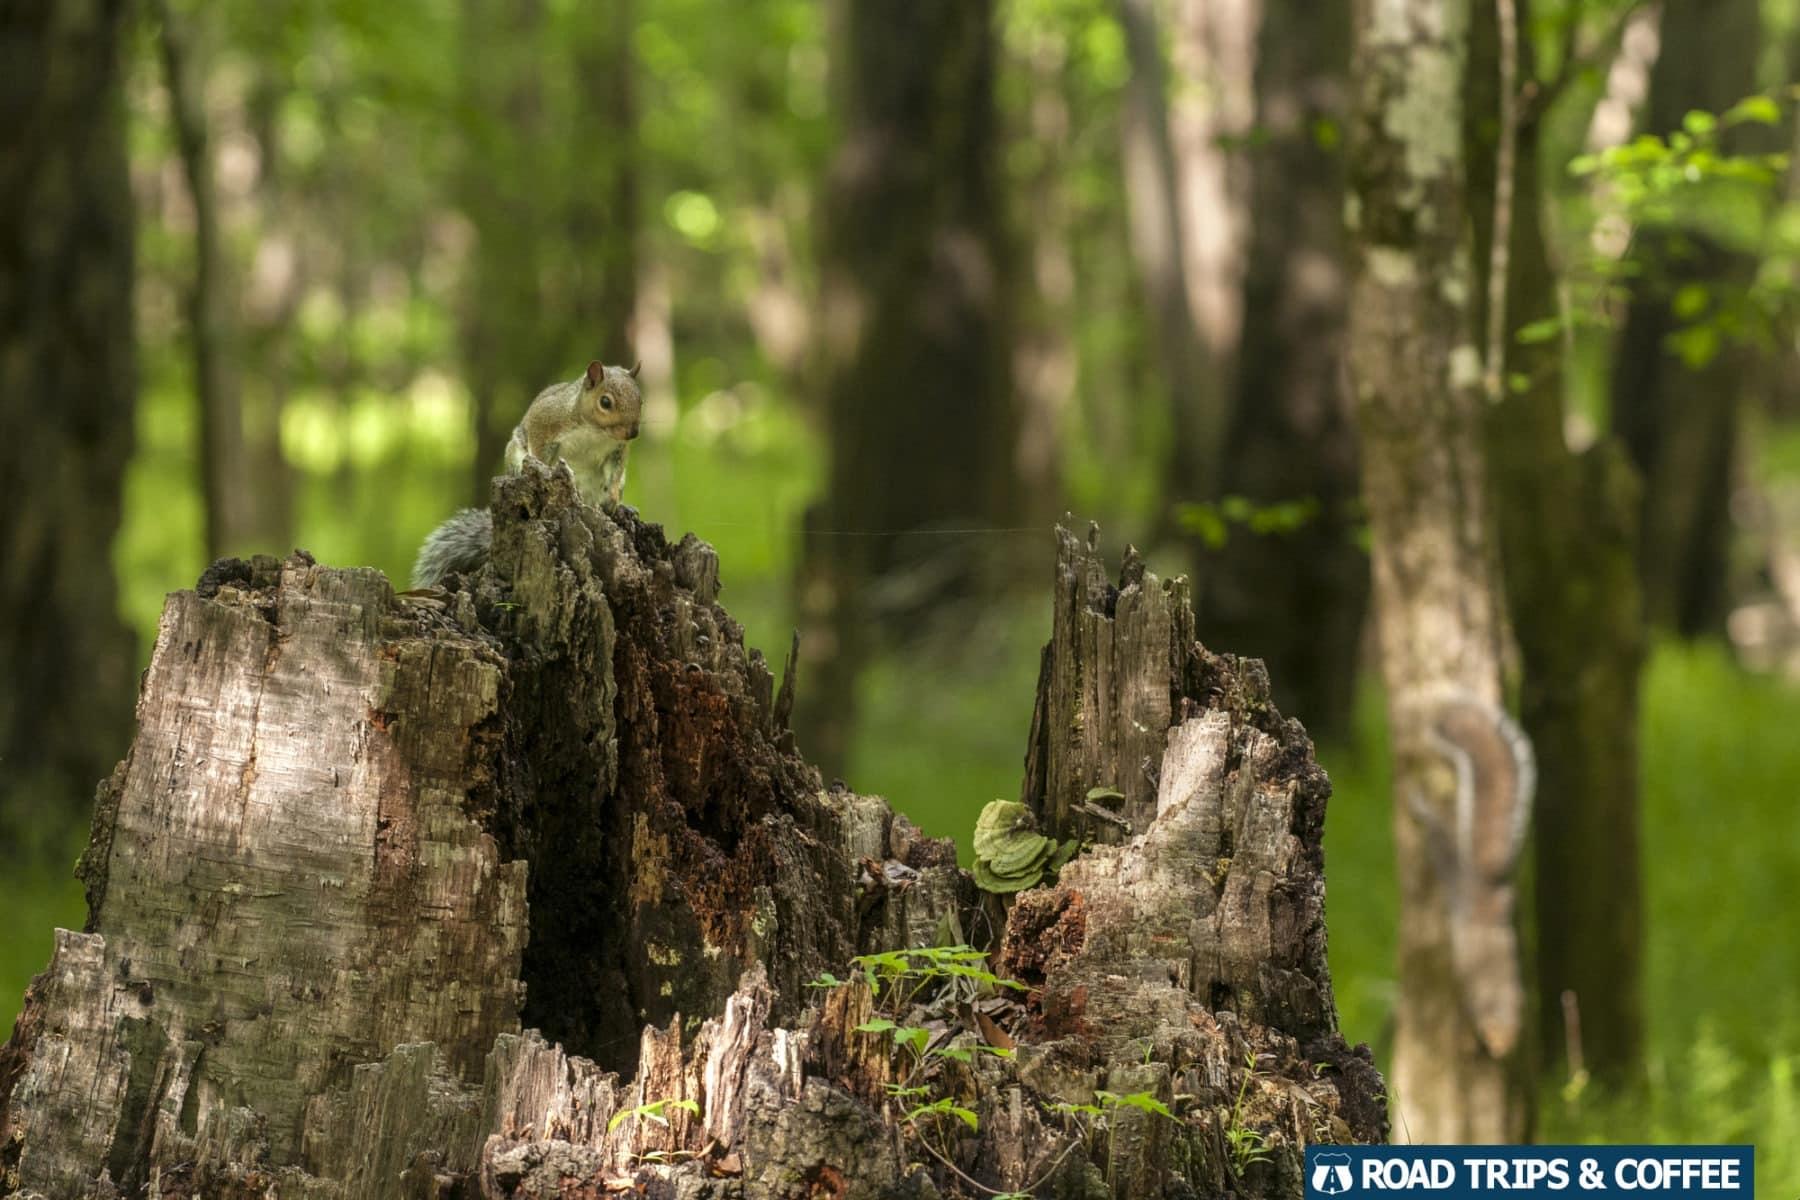 A squirrel sits atop a broken stump of a tree at Congaree National Park in South Carolina